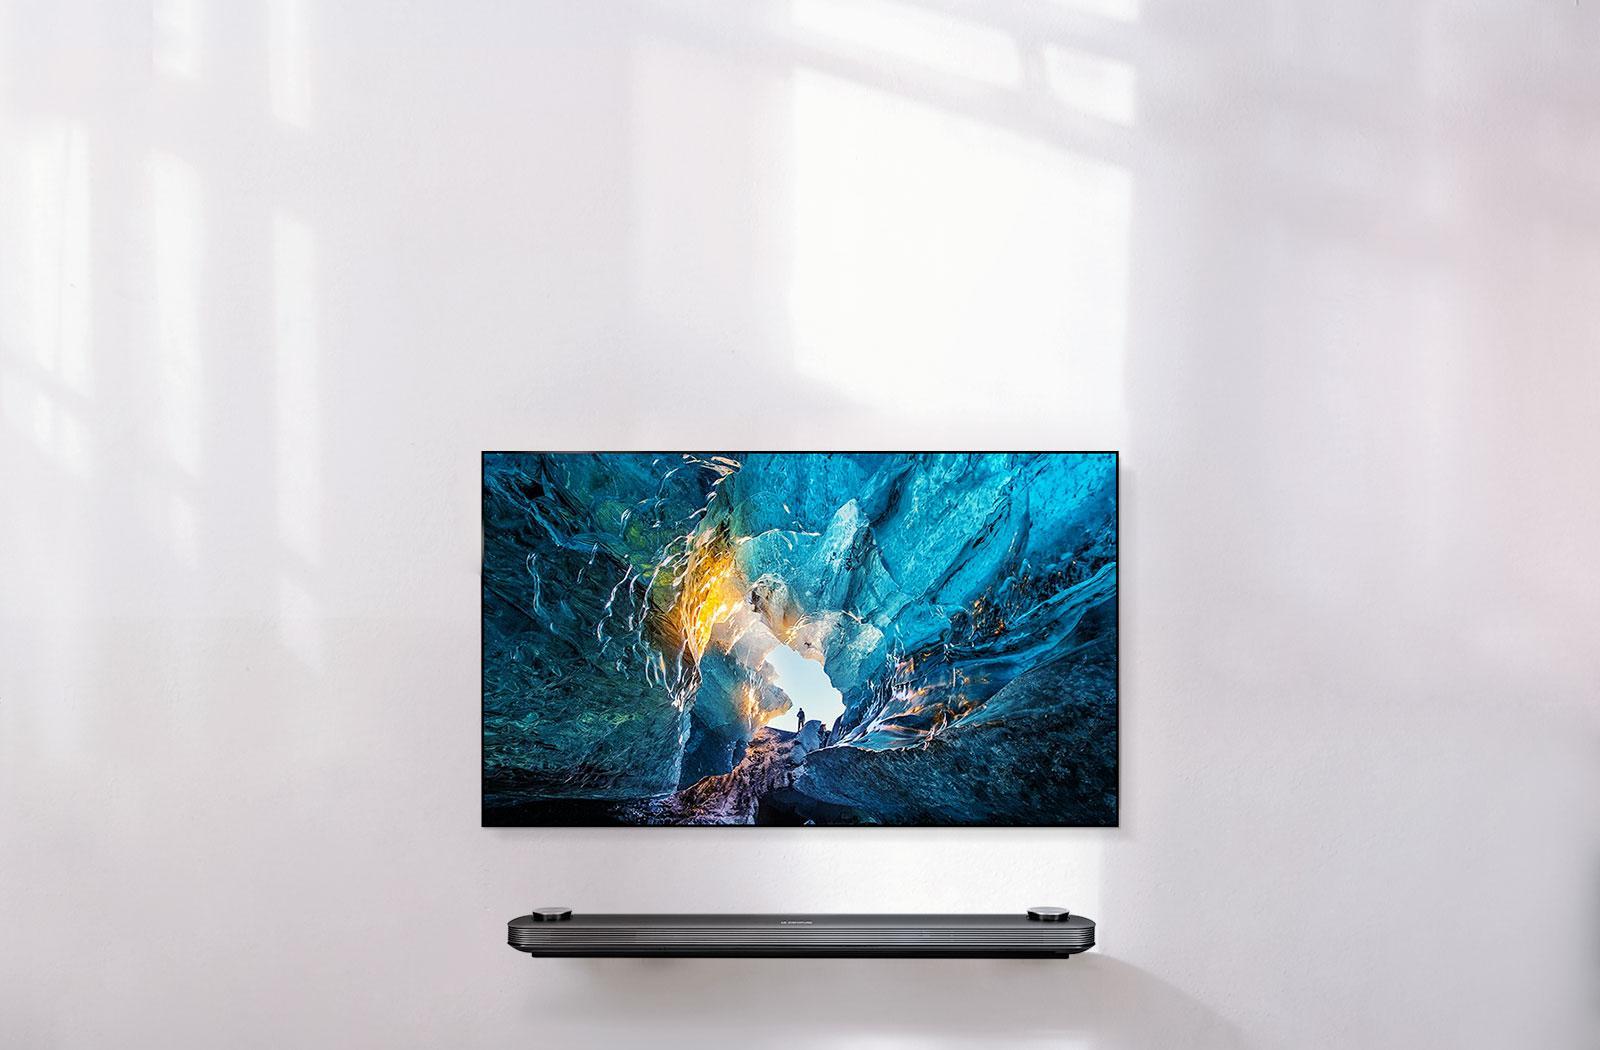 LG TV Wallpapers - Wallpaper Cave